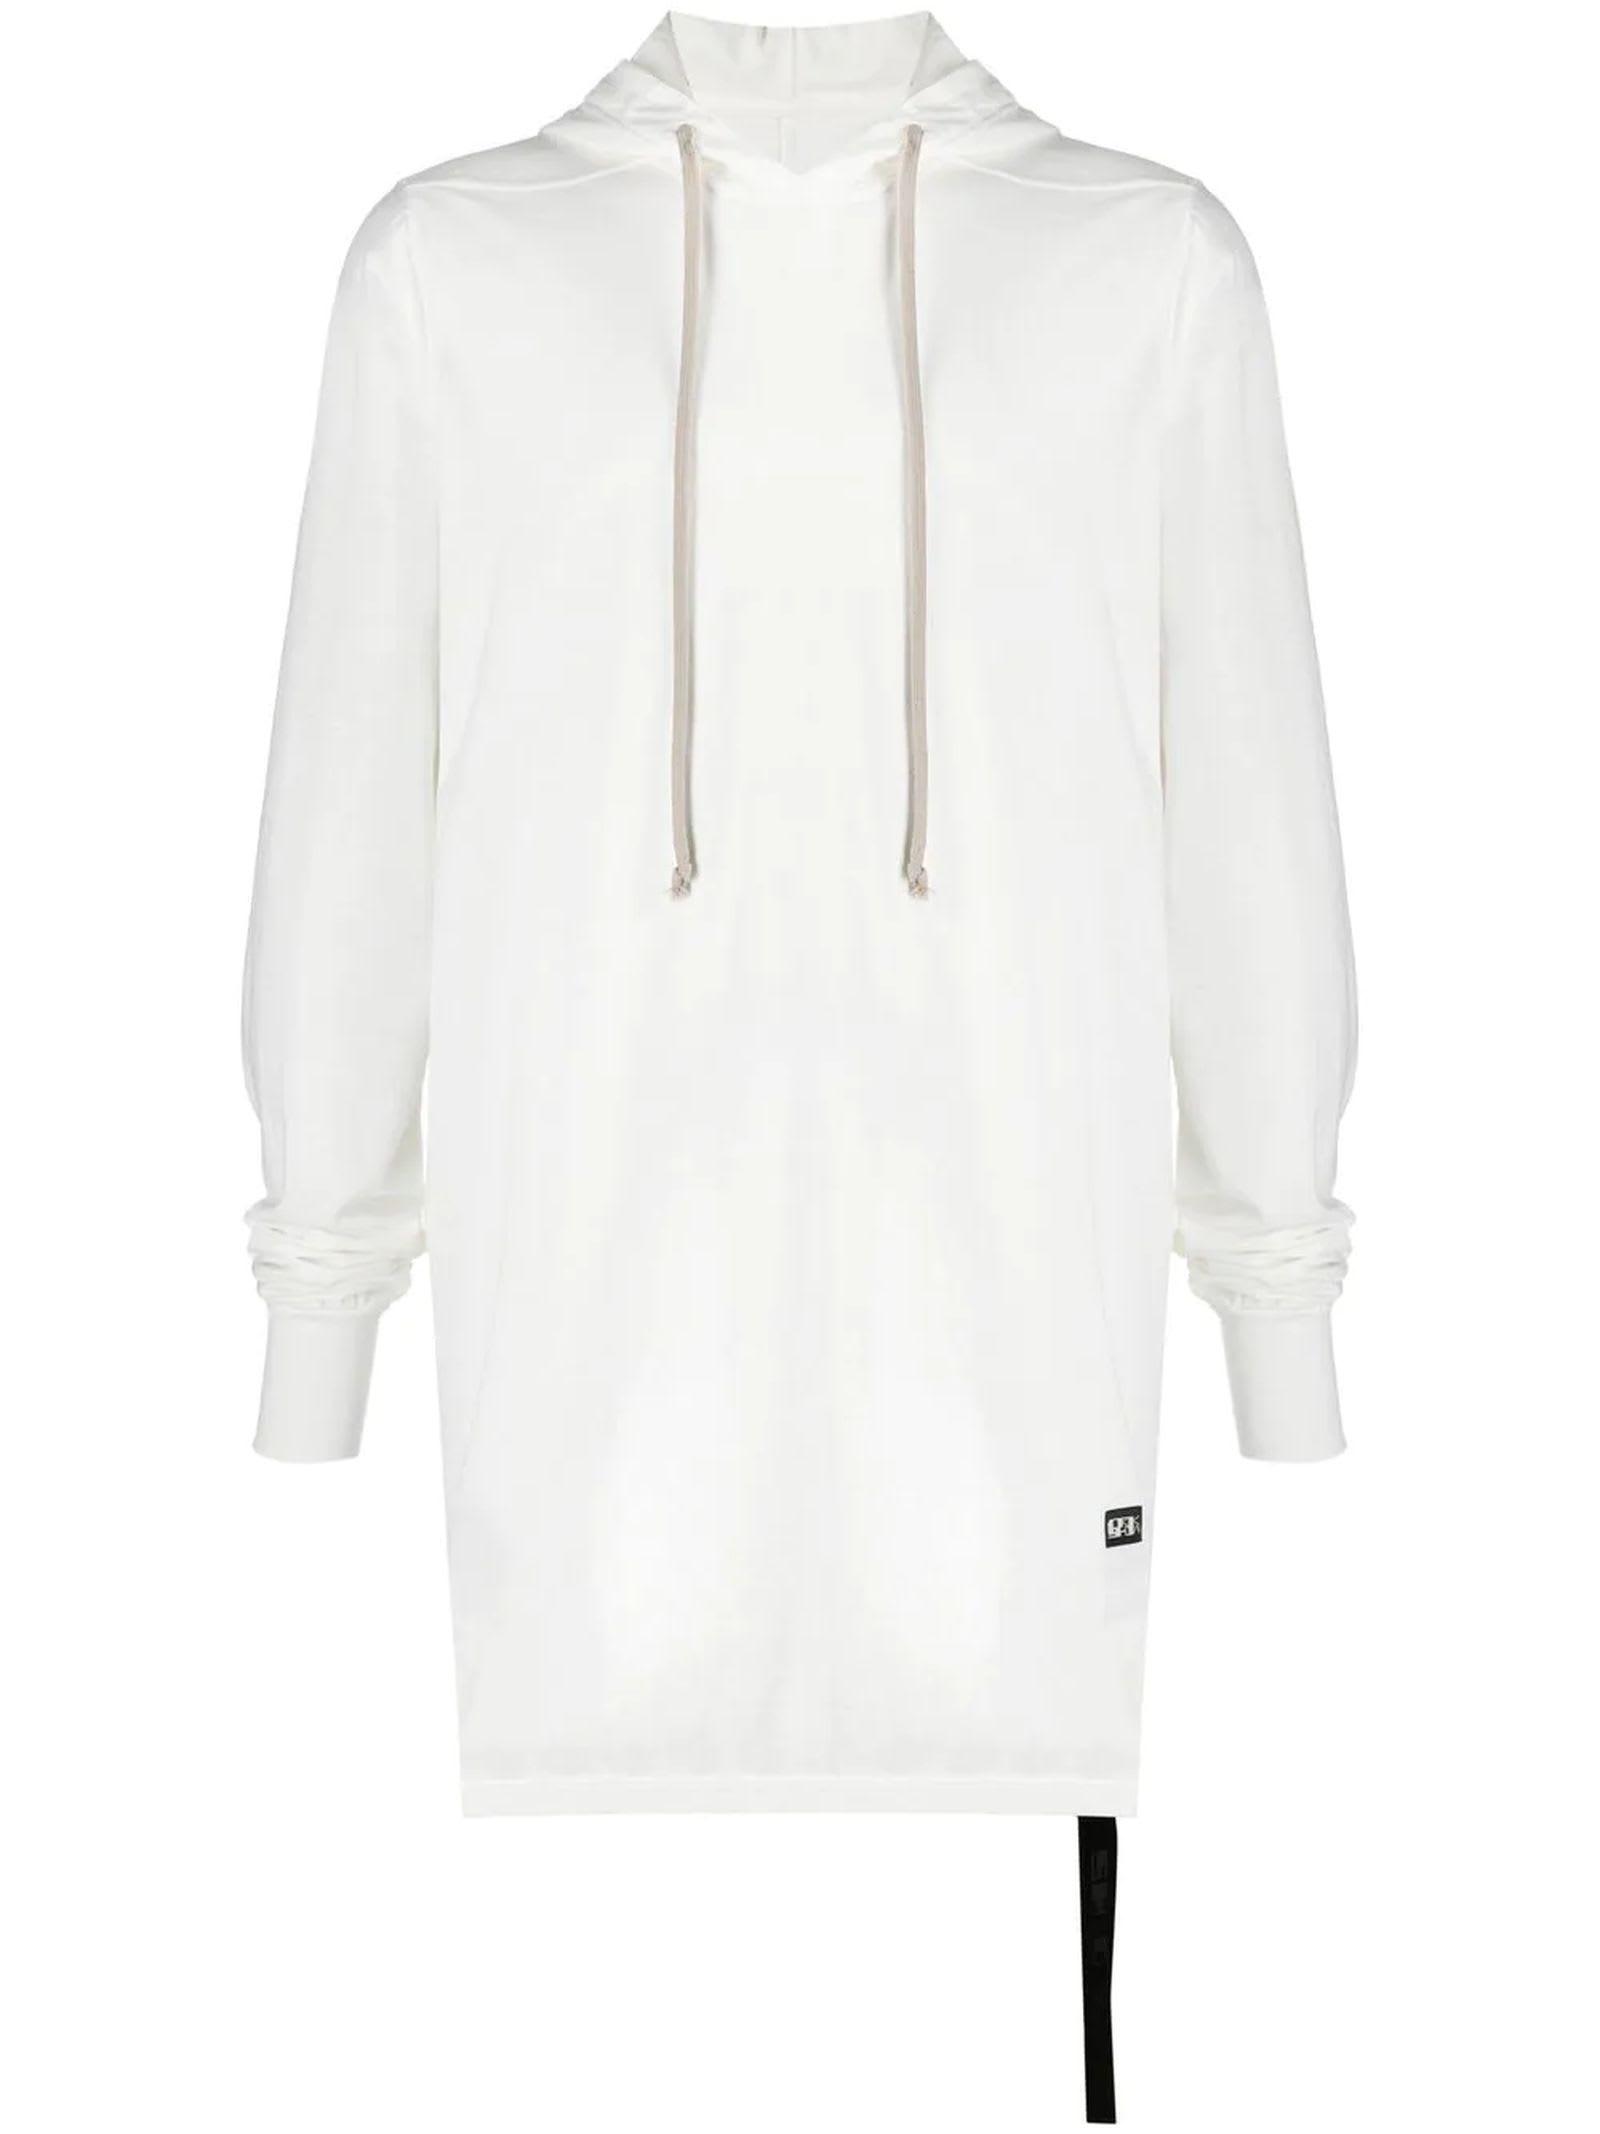 DRKSHDW White Cotton Hoodie